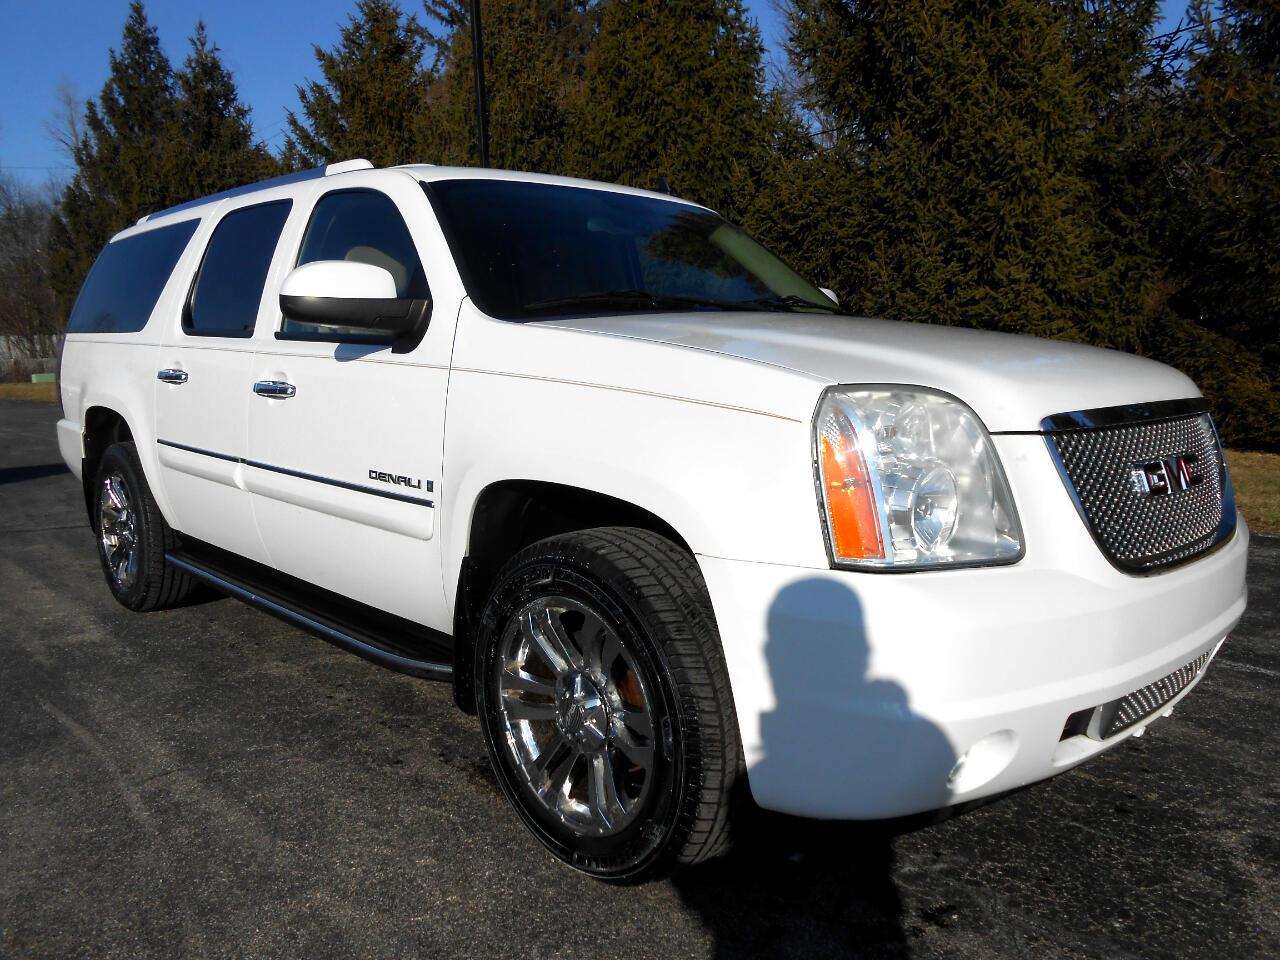 2008 GMC Yukon Denali XL AWD